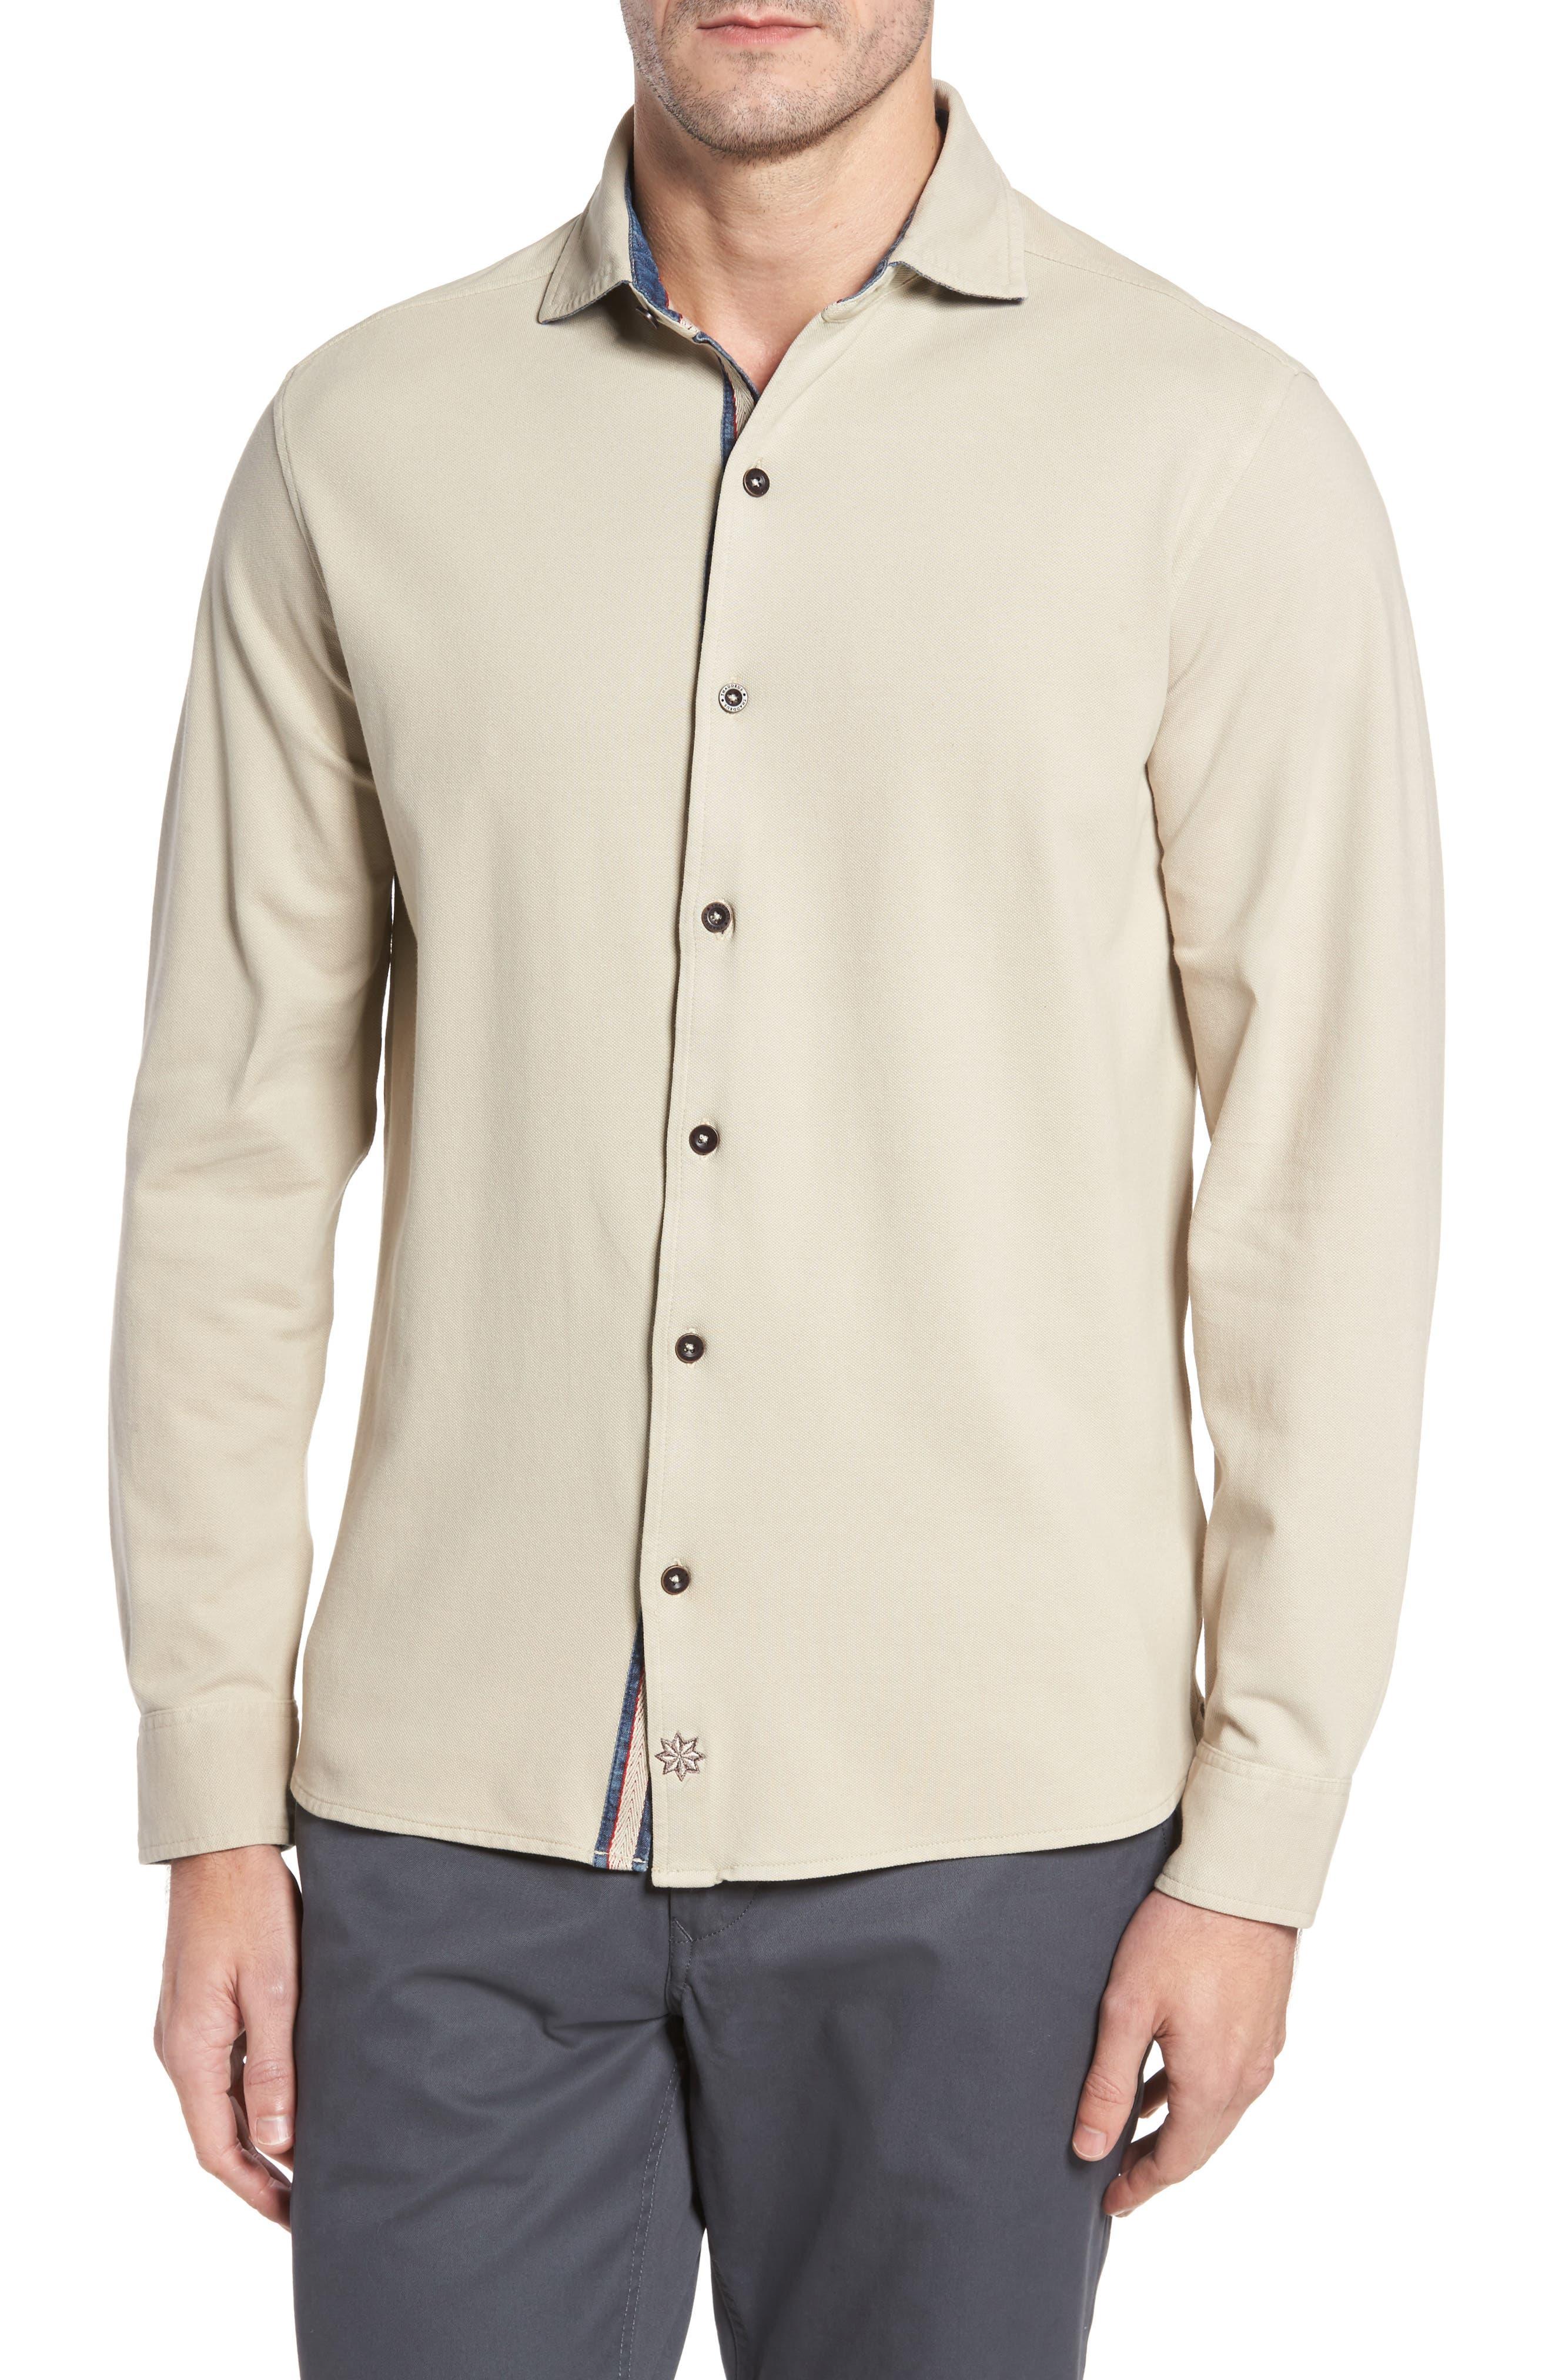 Main Image - Thaddeus Shively Piqué Knit Sport Shirt